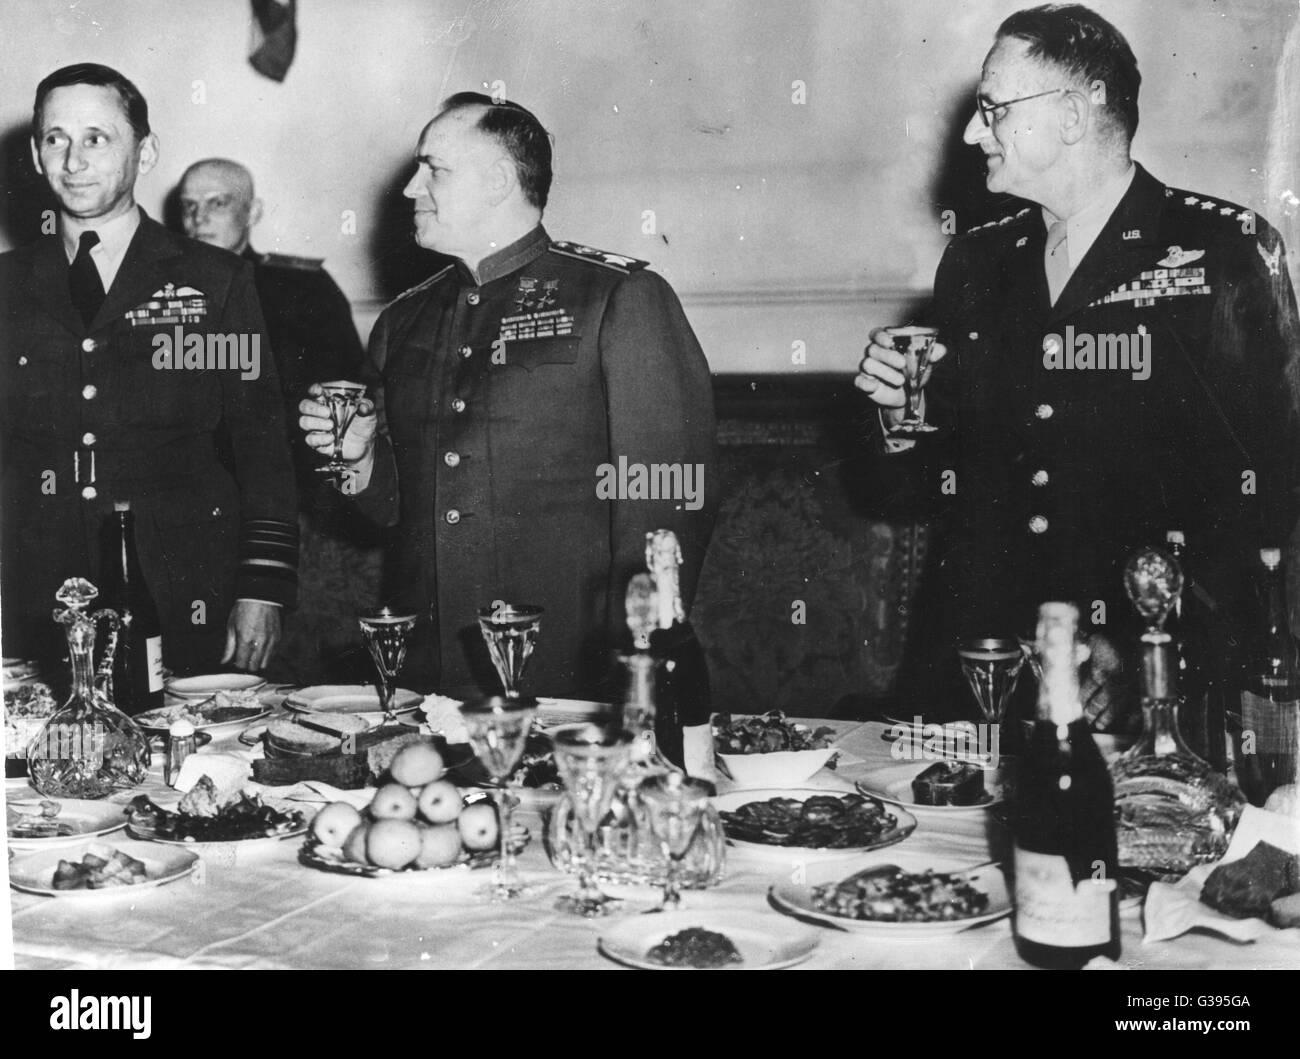 (L-R) Air Chief Marshal Sir Arthur Tedder, Deputy Supreme Commander Allied Forces, Field Marshal Georgy K. Zhukov, - Stock Image